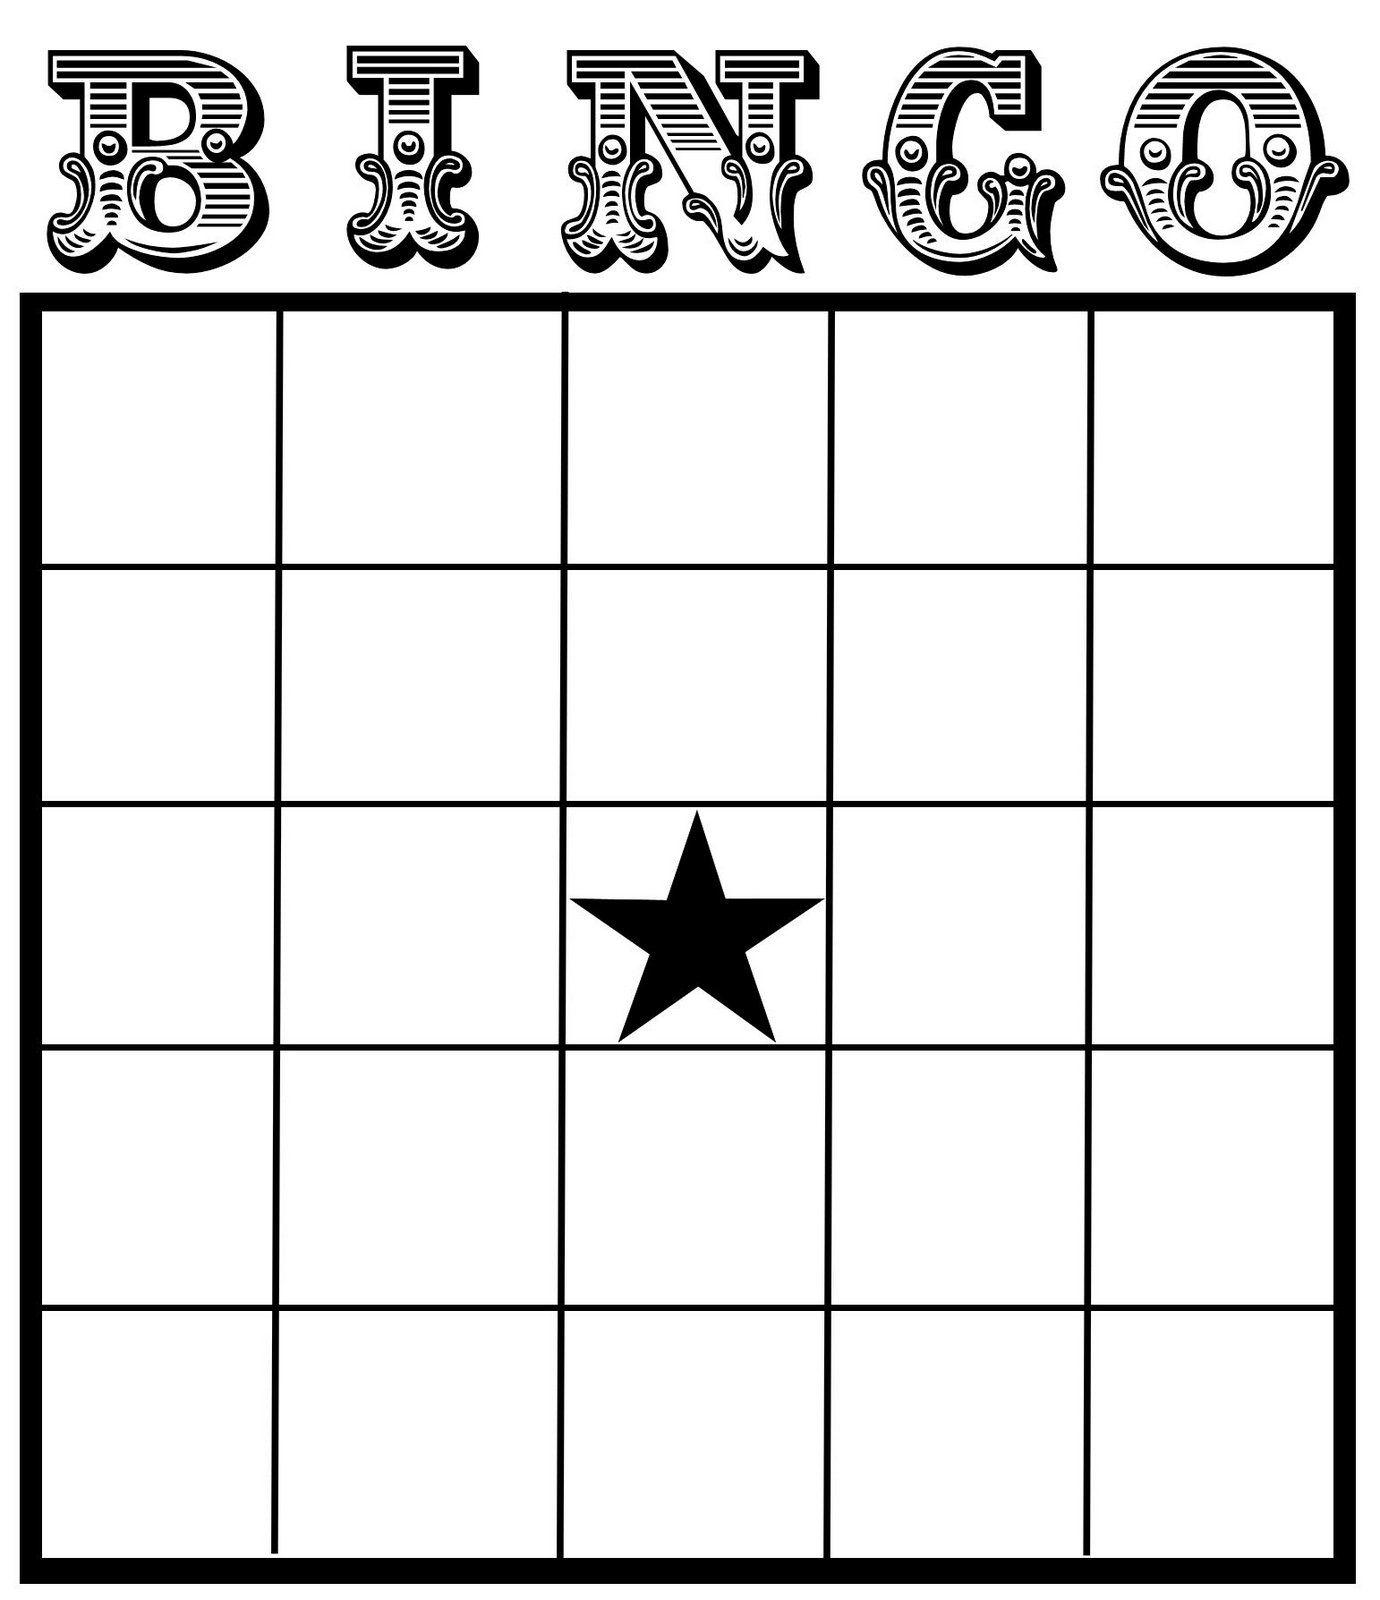 Let S Play Some Roller Derby Bingo Via R Rollerderby